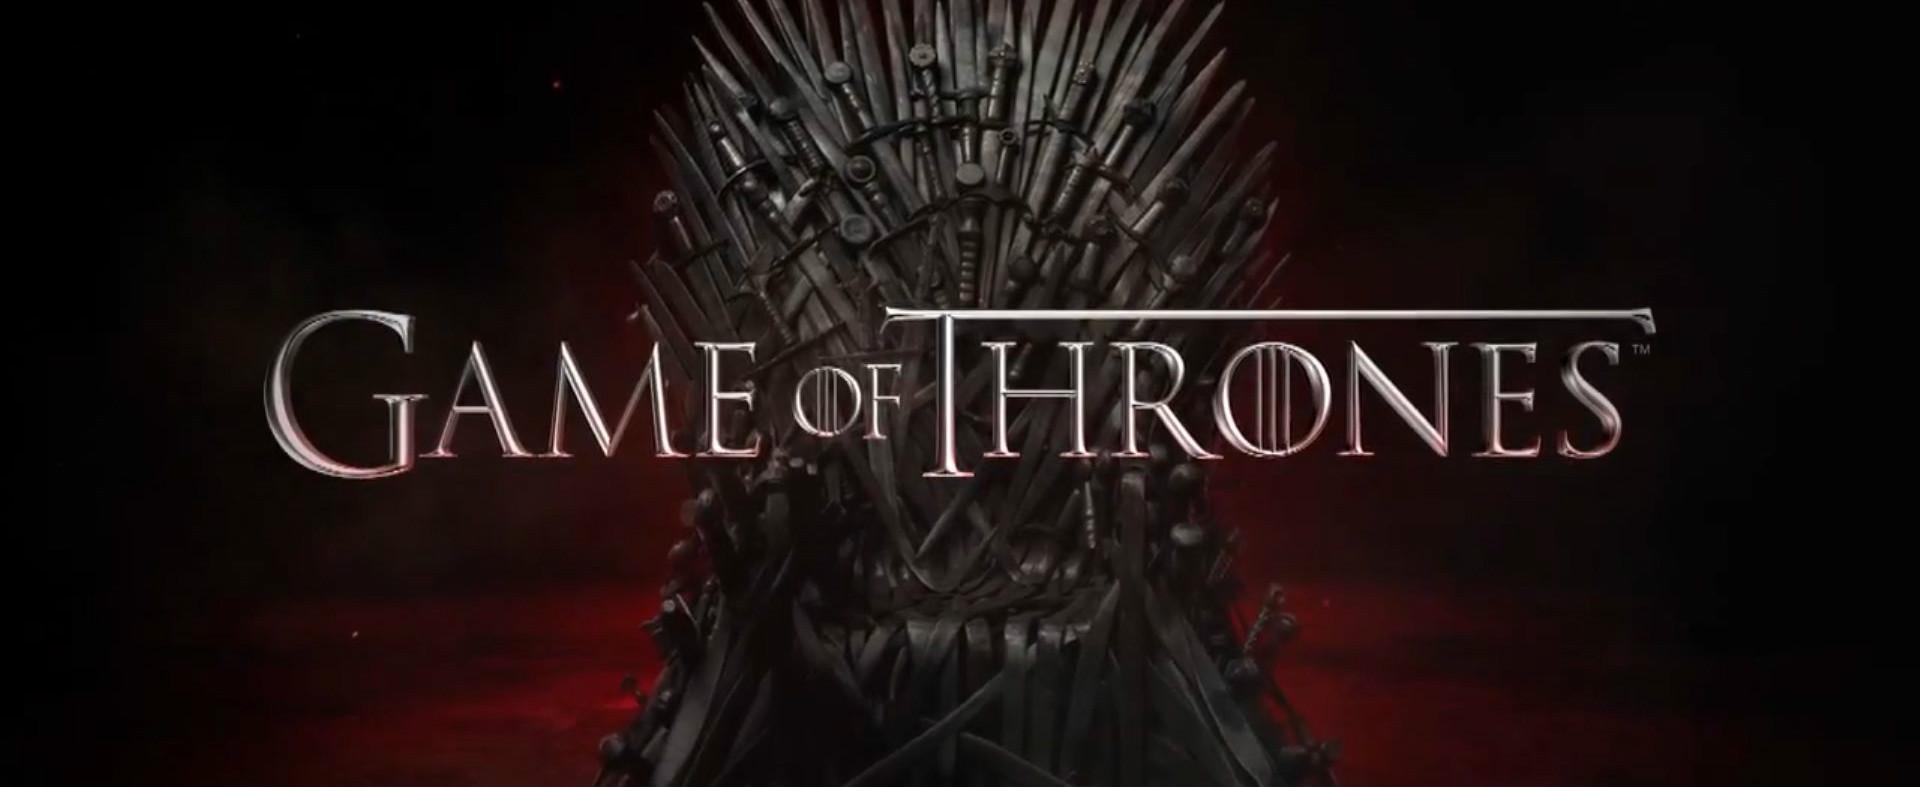 game-of-thrones-logo-2